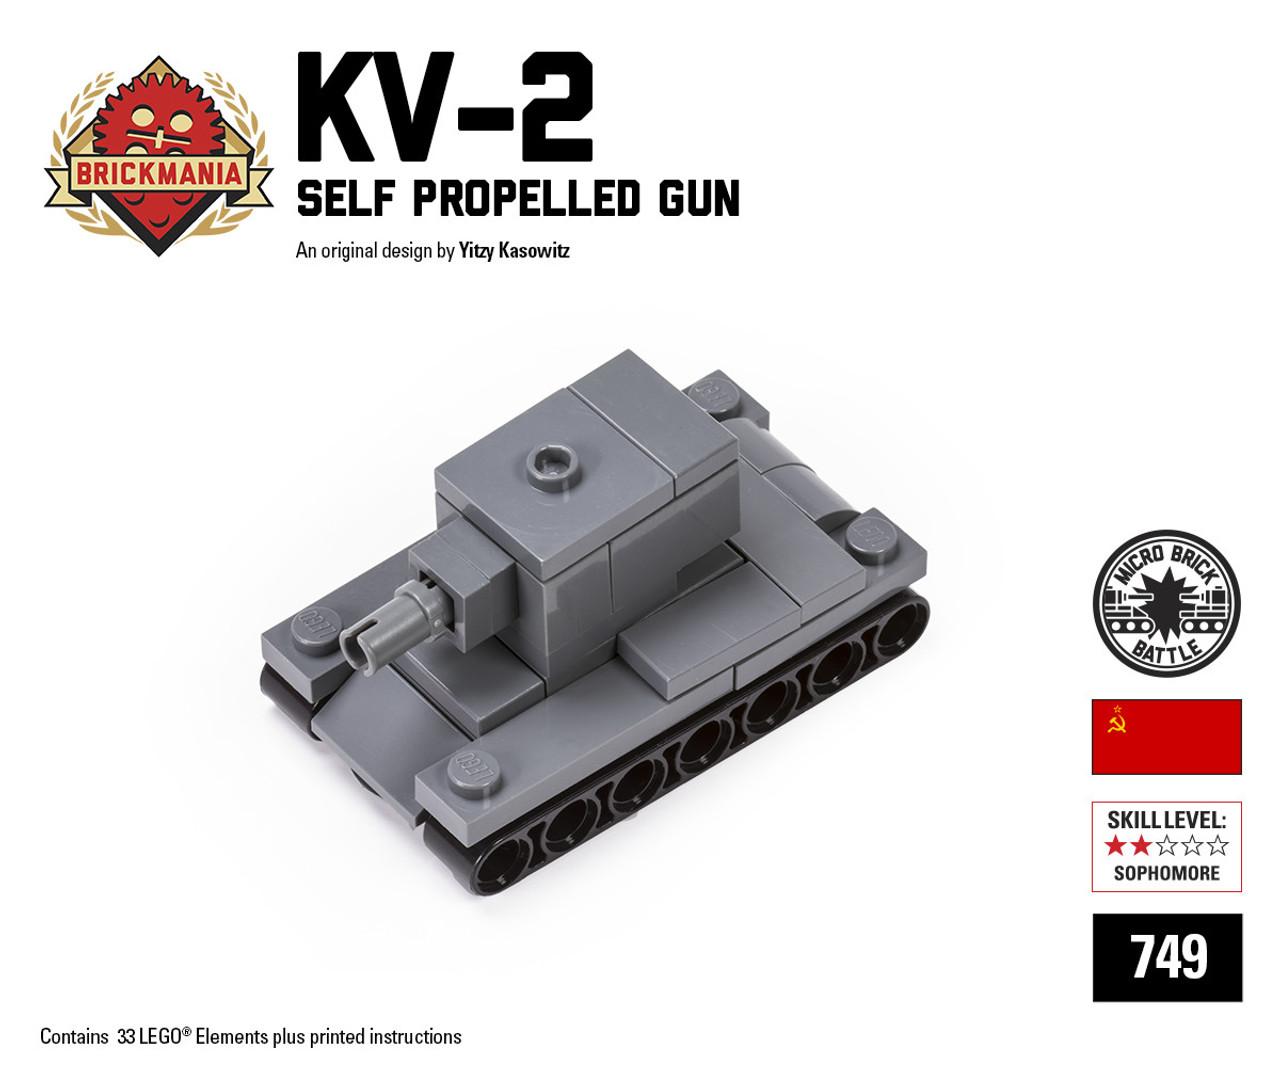 Micro Brick Battle Kv 2 Brickmania Toys